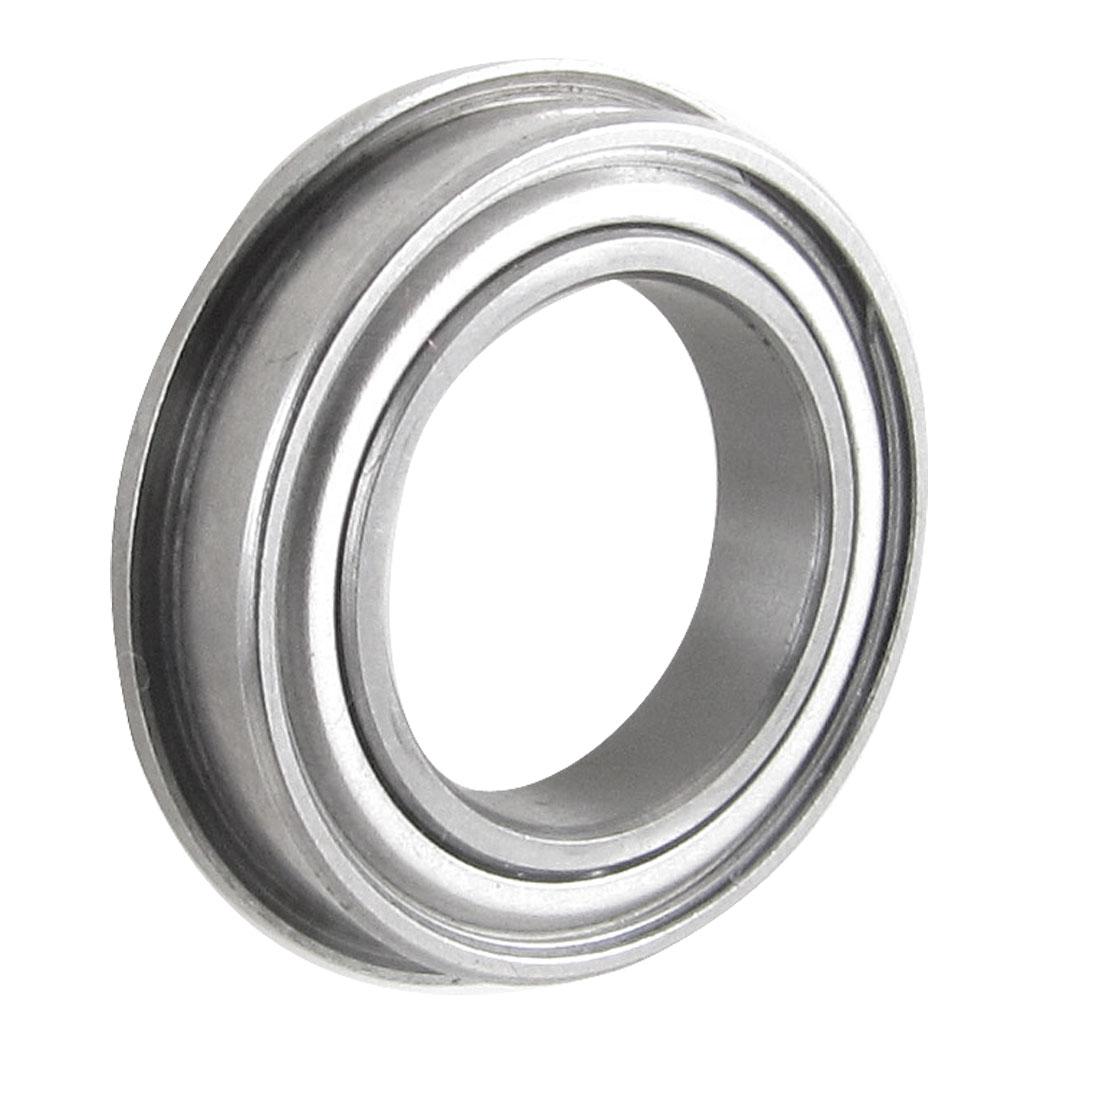 Flanged 15mm x 24mm x 5mm Metal Shields Deep Groove Ball Bearing F6802